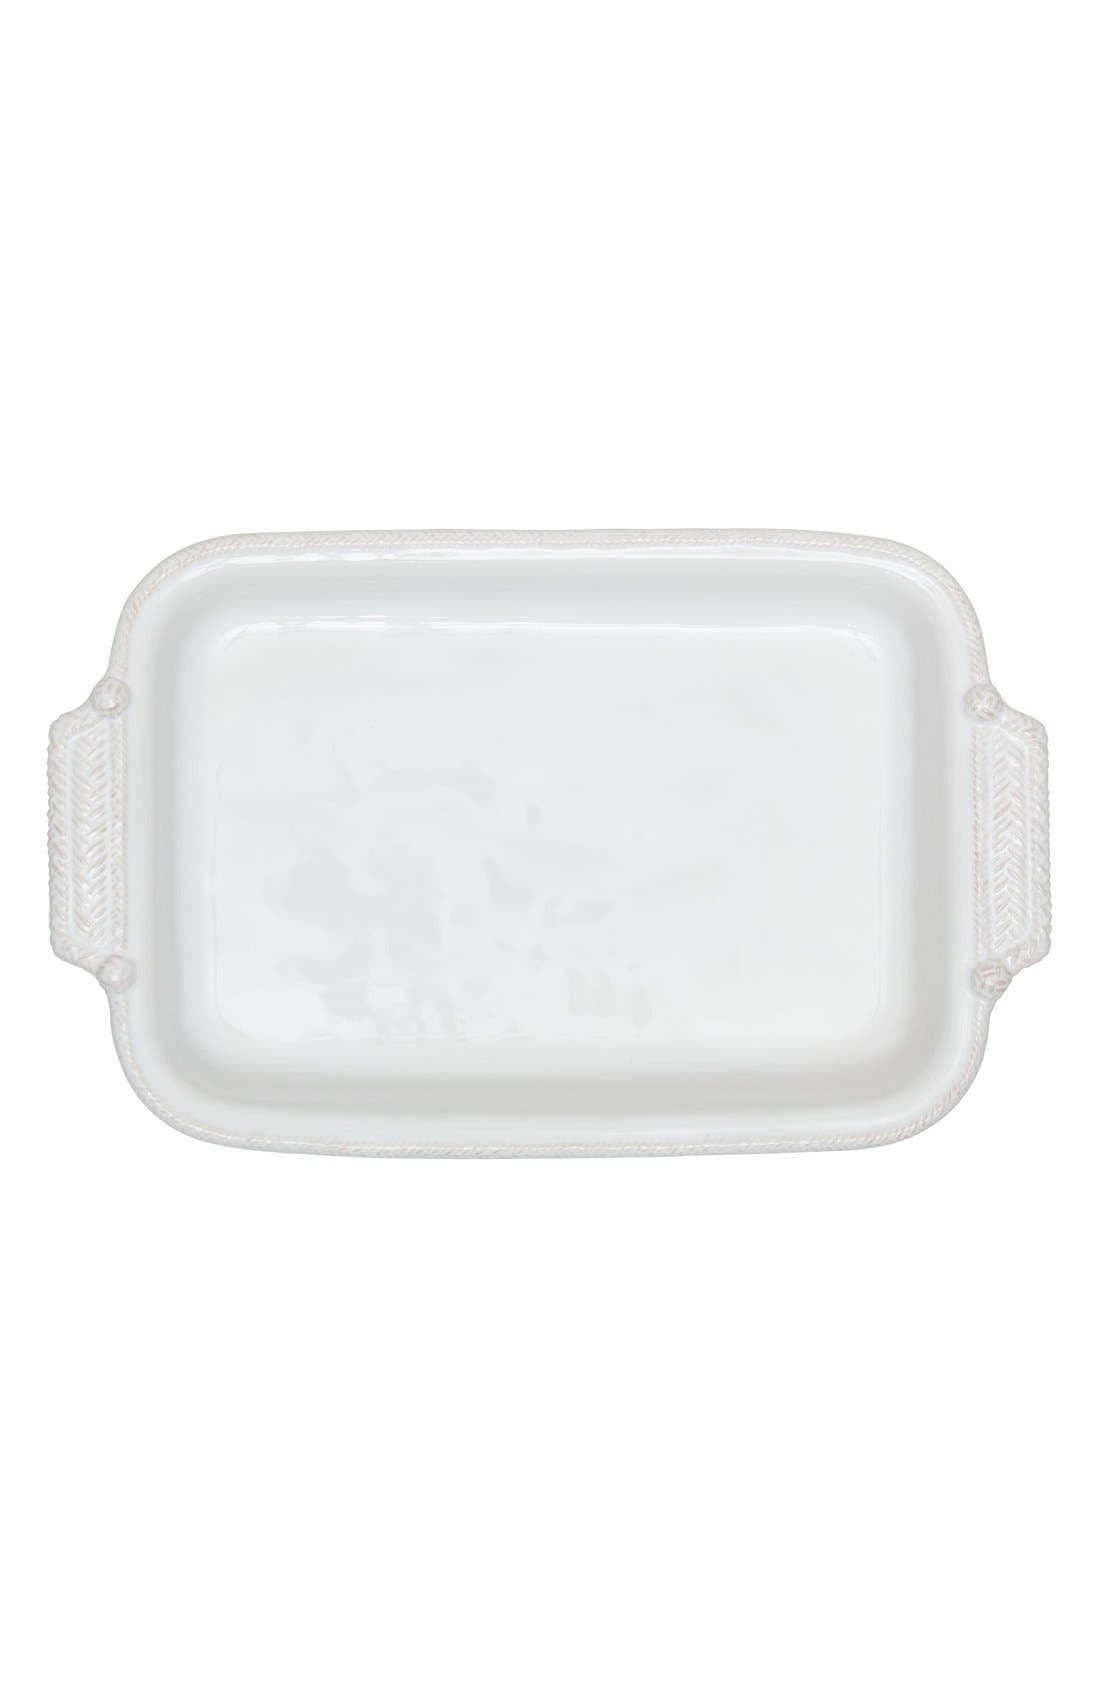 Le Panier 2.5-Quart Rectangular Baking Dish,                             Main thumbnail 1, color,